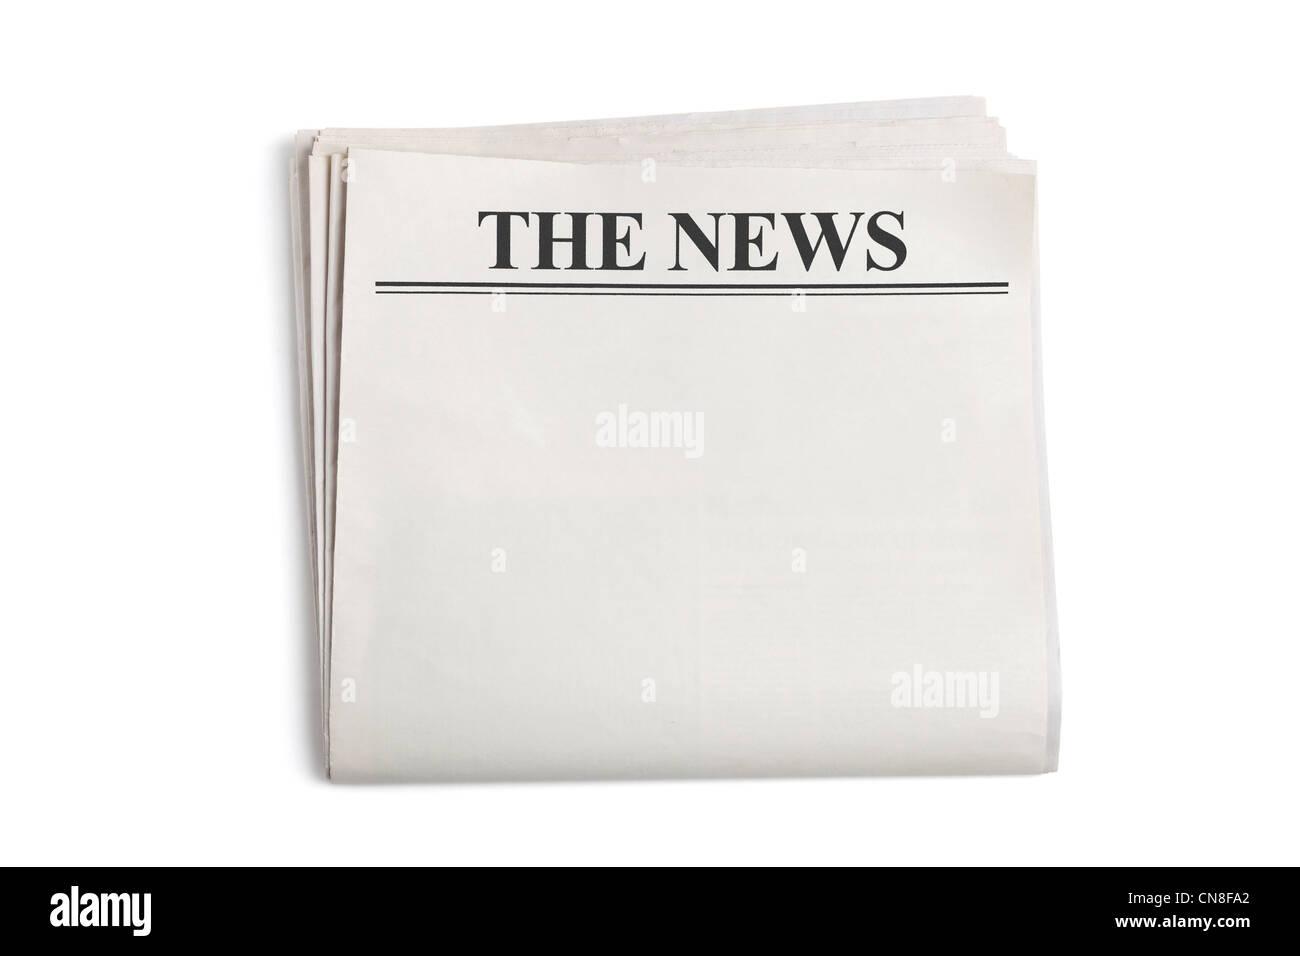 newspaper headline blank stock photos & newspaper headline blank